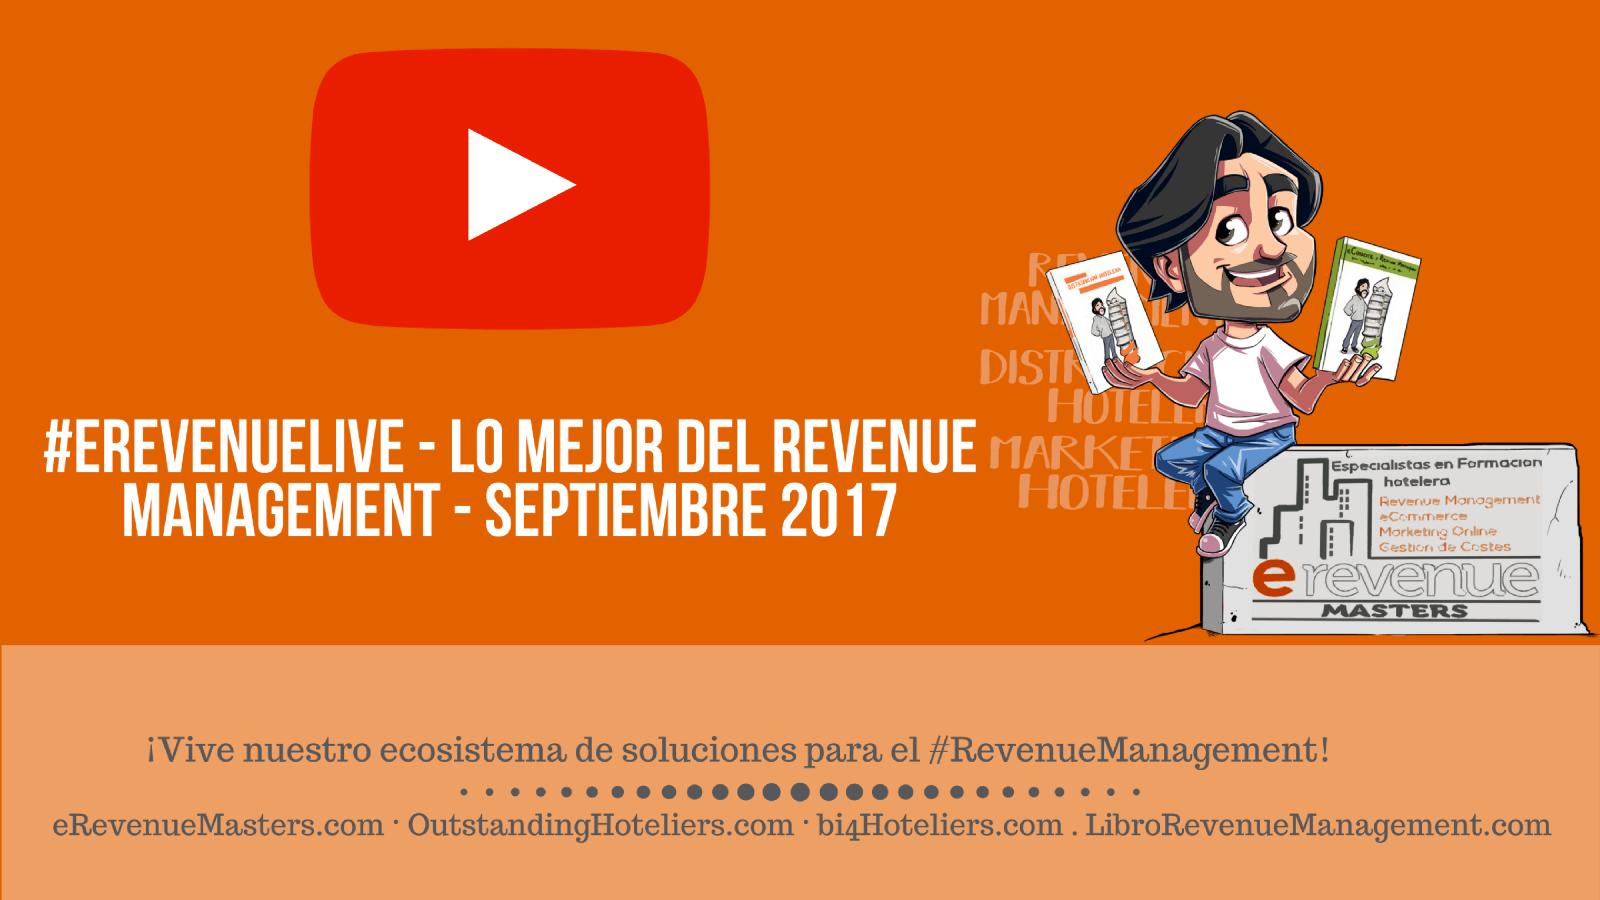 eRevenueMastersTV: septiembre 2017- Lo mejor del Revenue Management